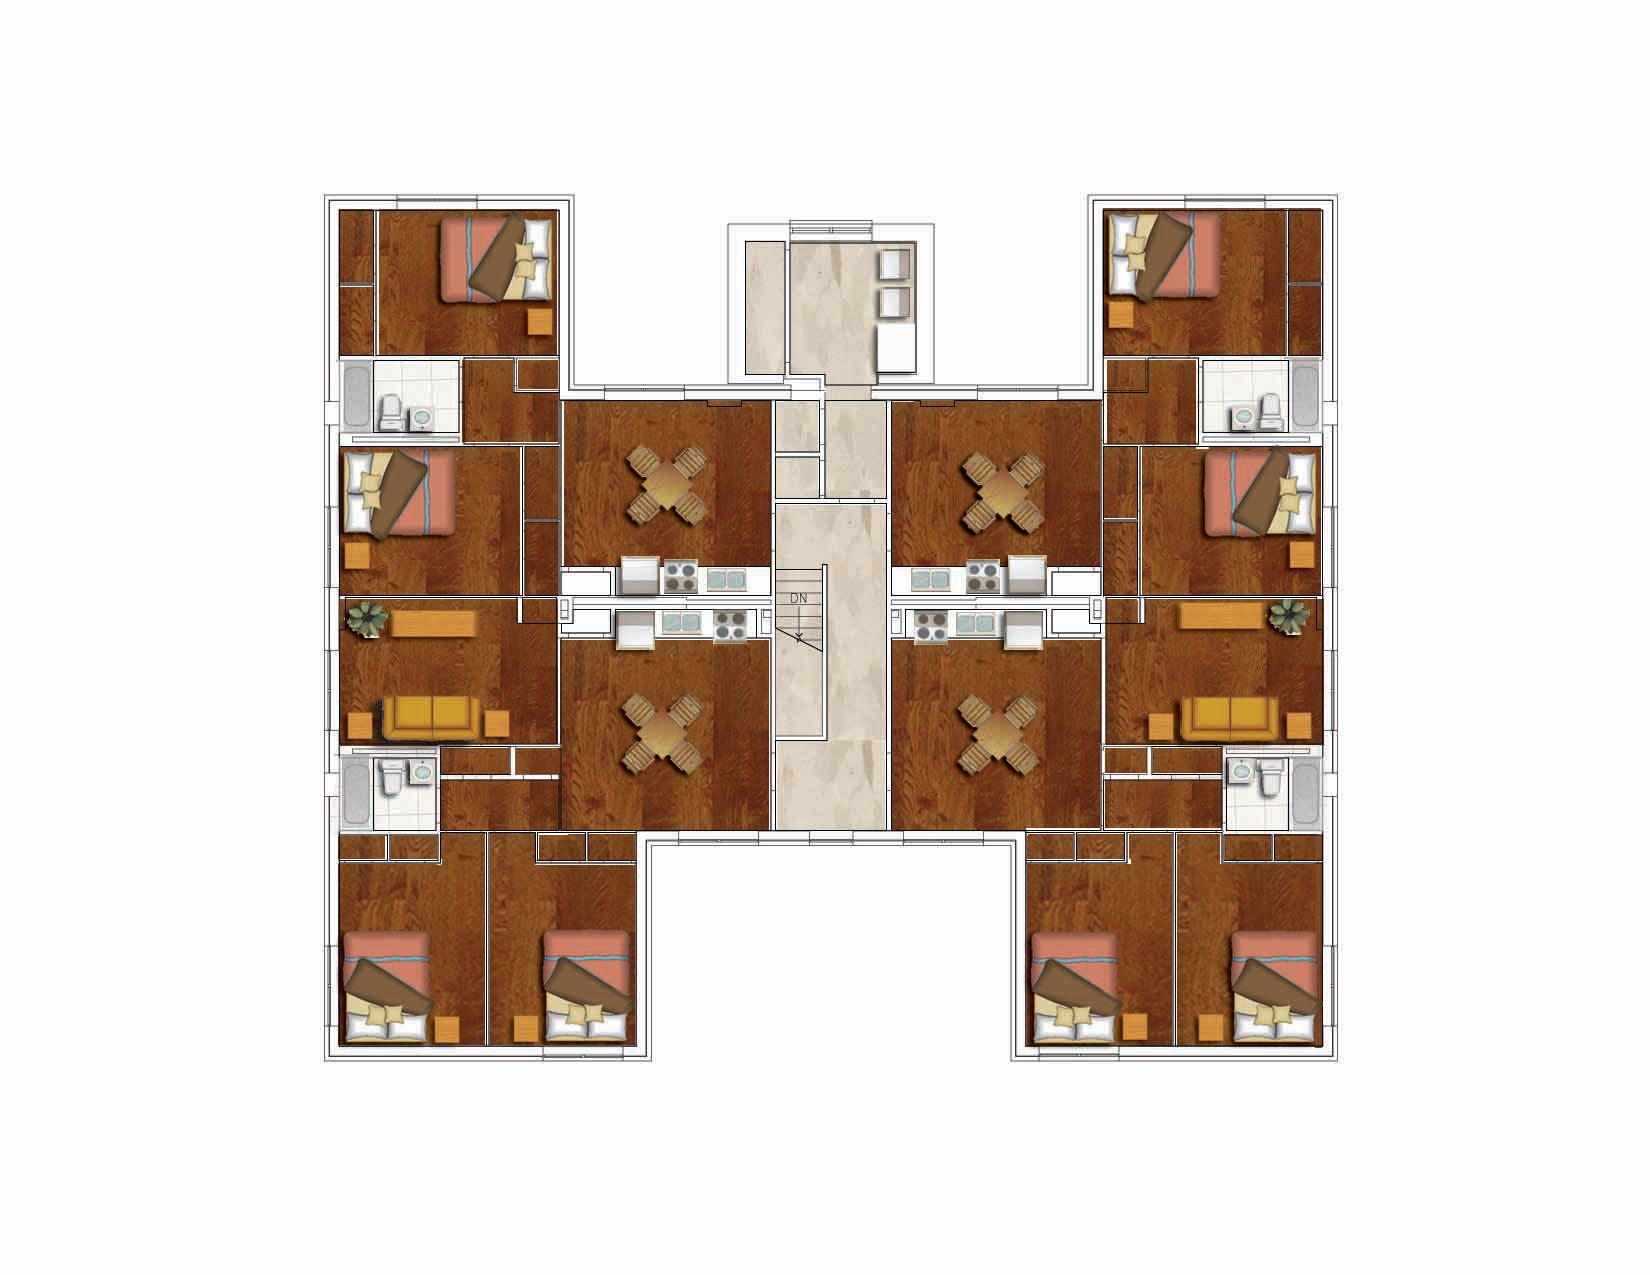 DSU CASSITY HALL RENOVATION